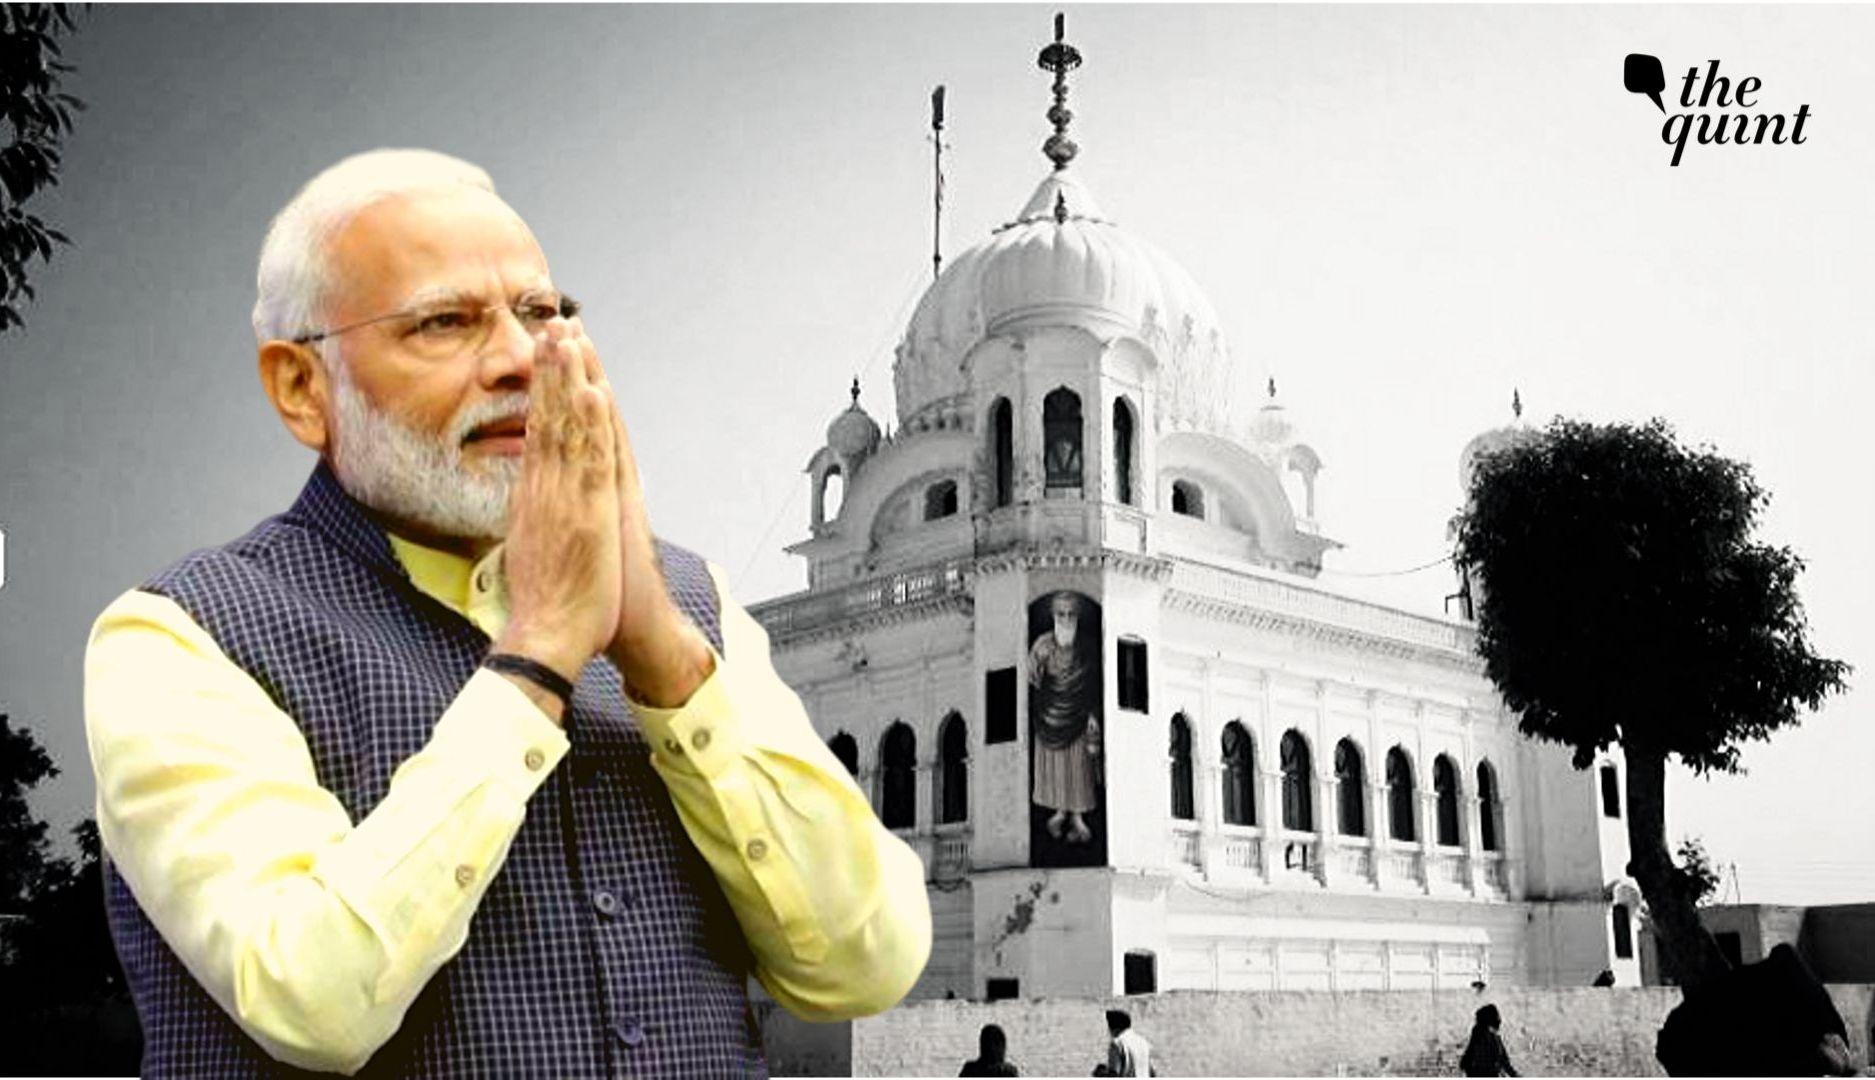 PM Modi to Inaugurate Kartarpur Corridor on Indian Side on 8 Nov